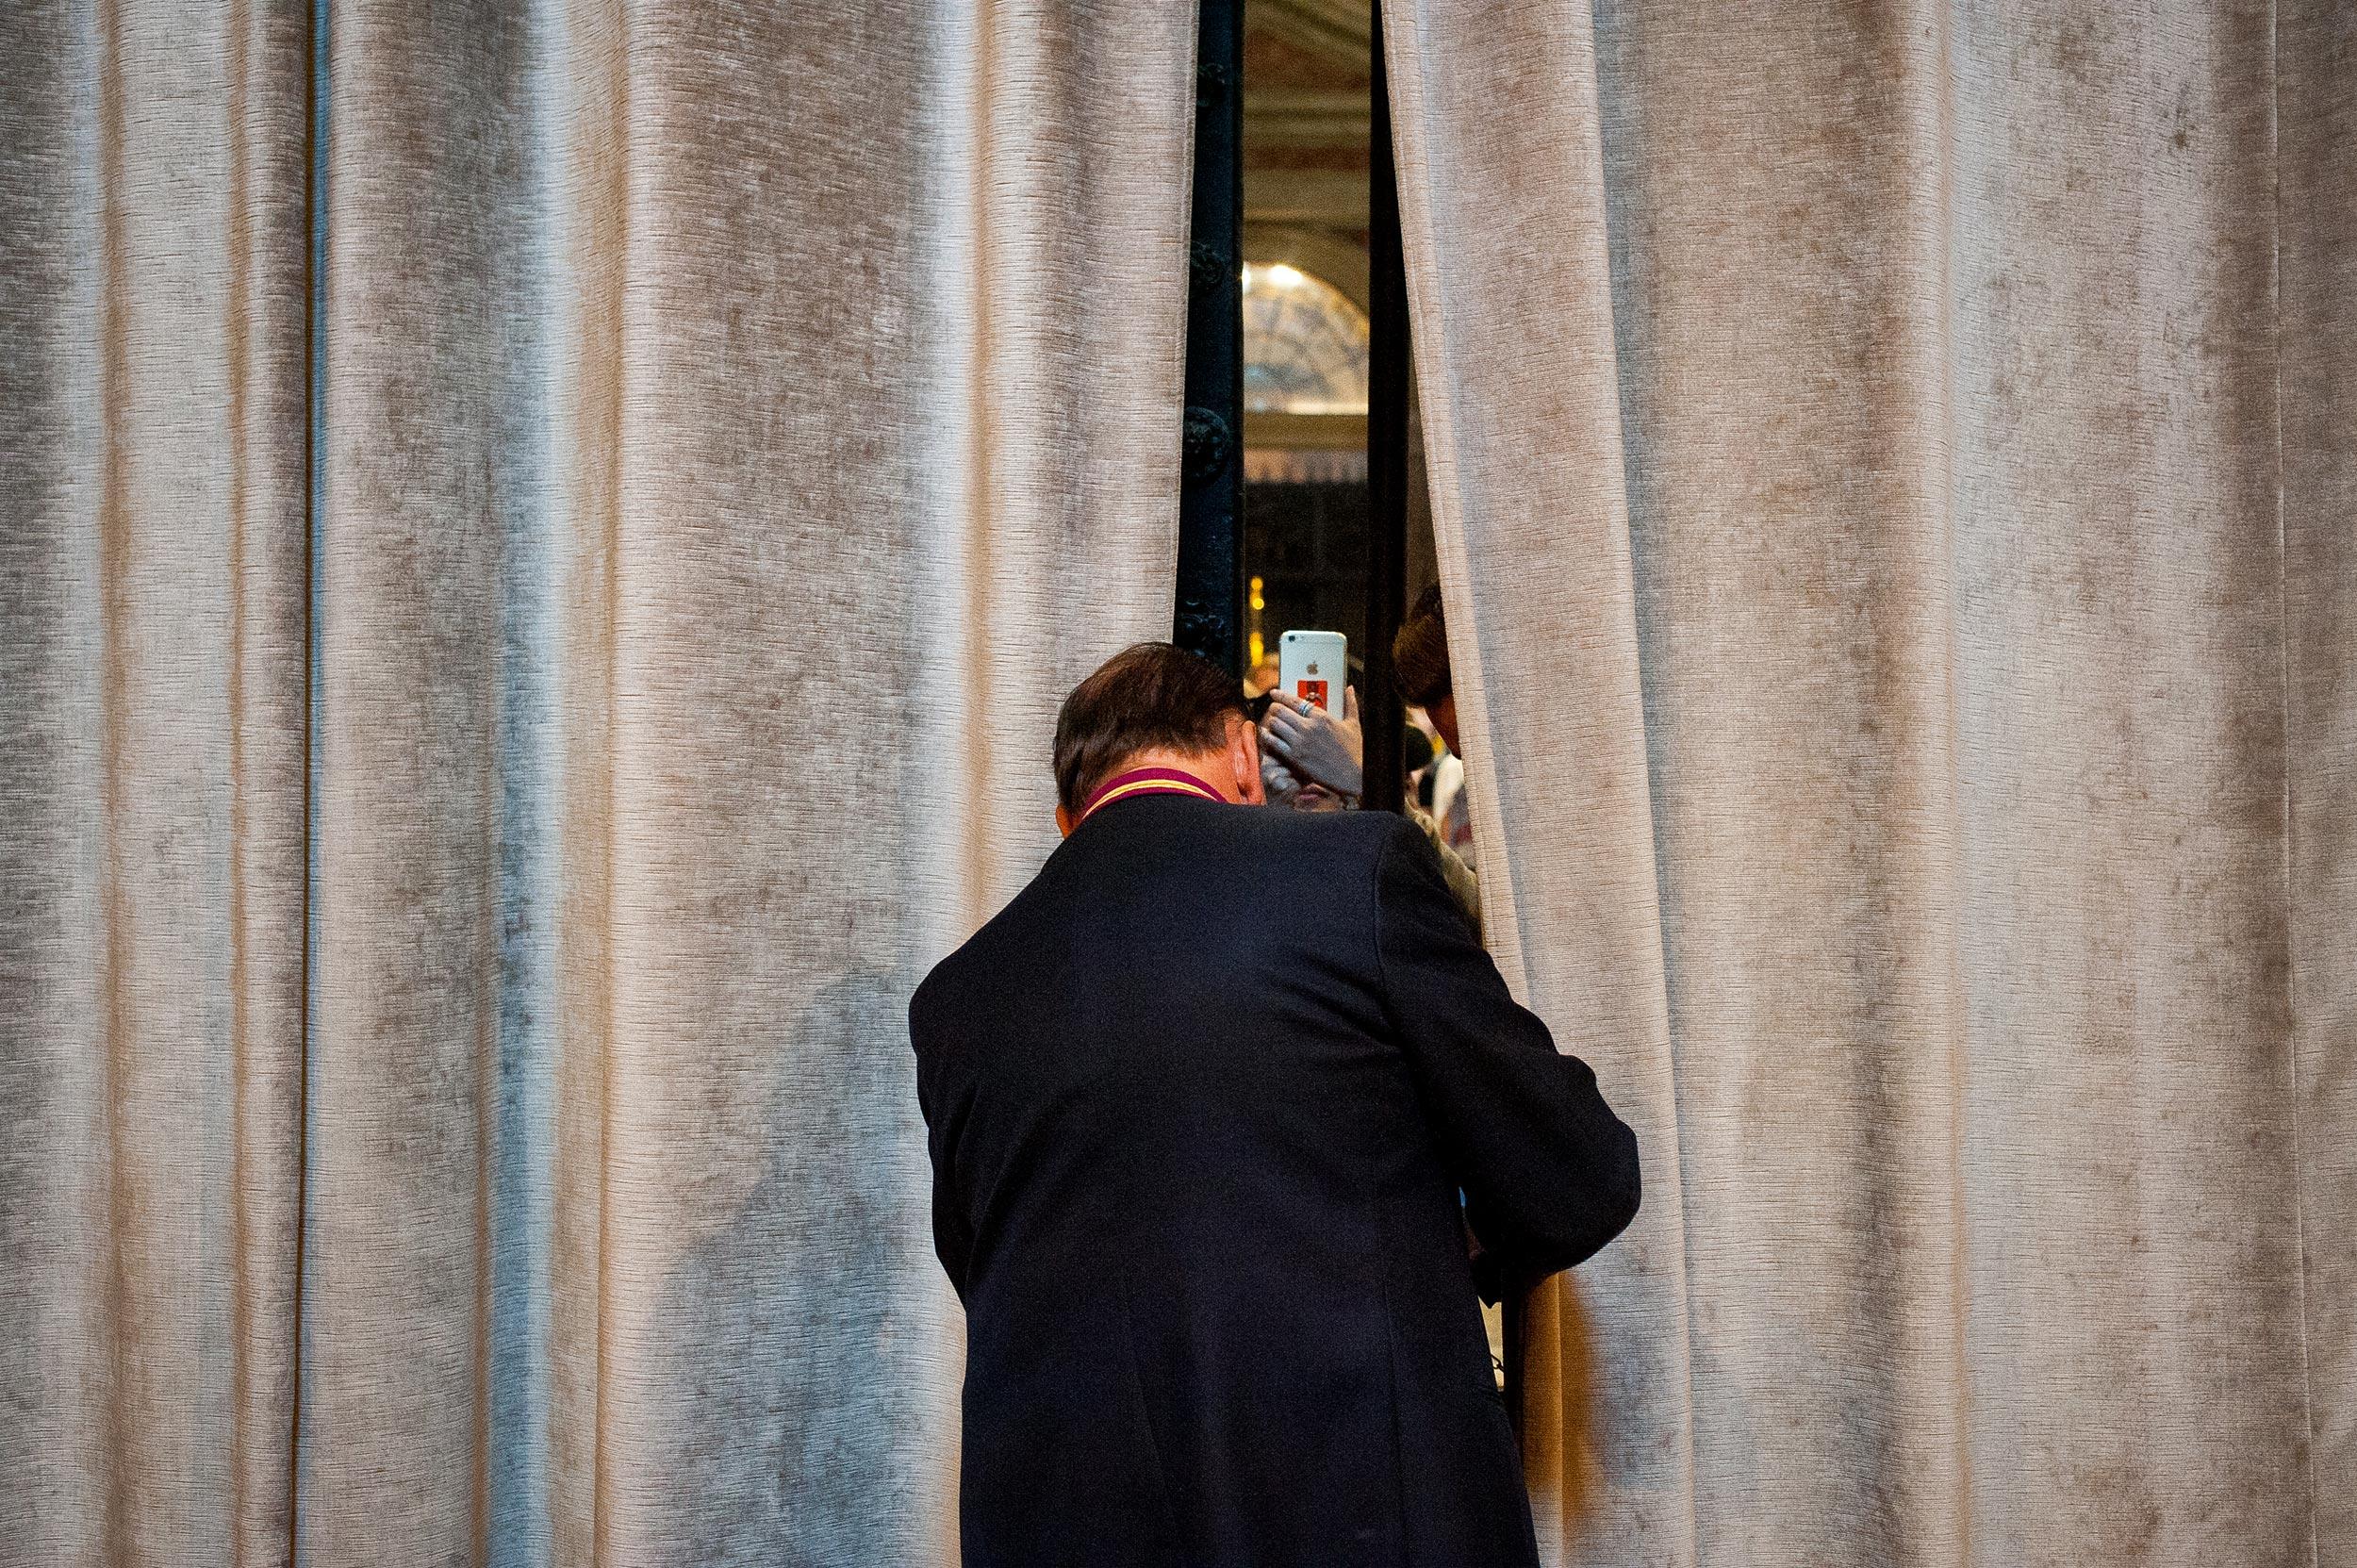 closing-curtains-st-peters-rome.jpg